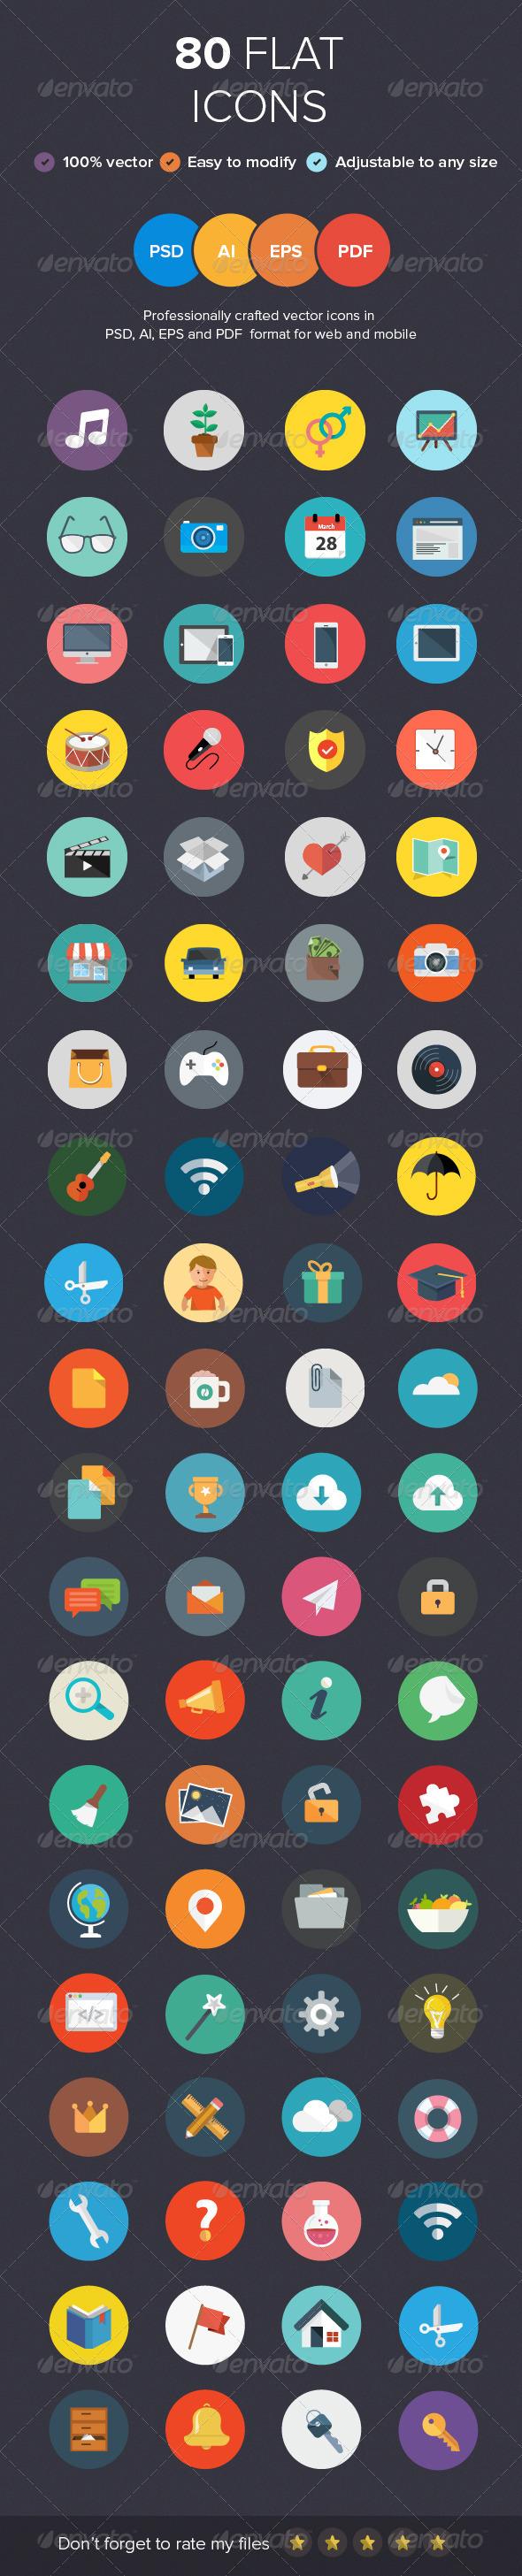 80 Flat Icons - Icons